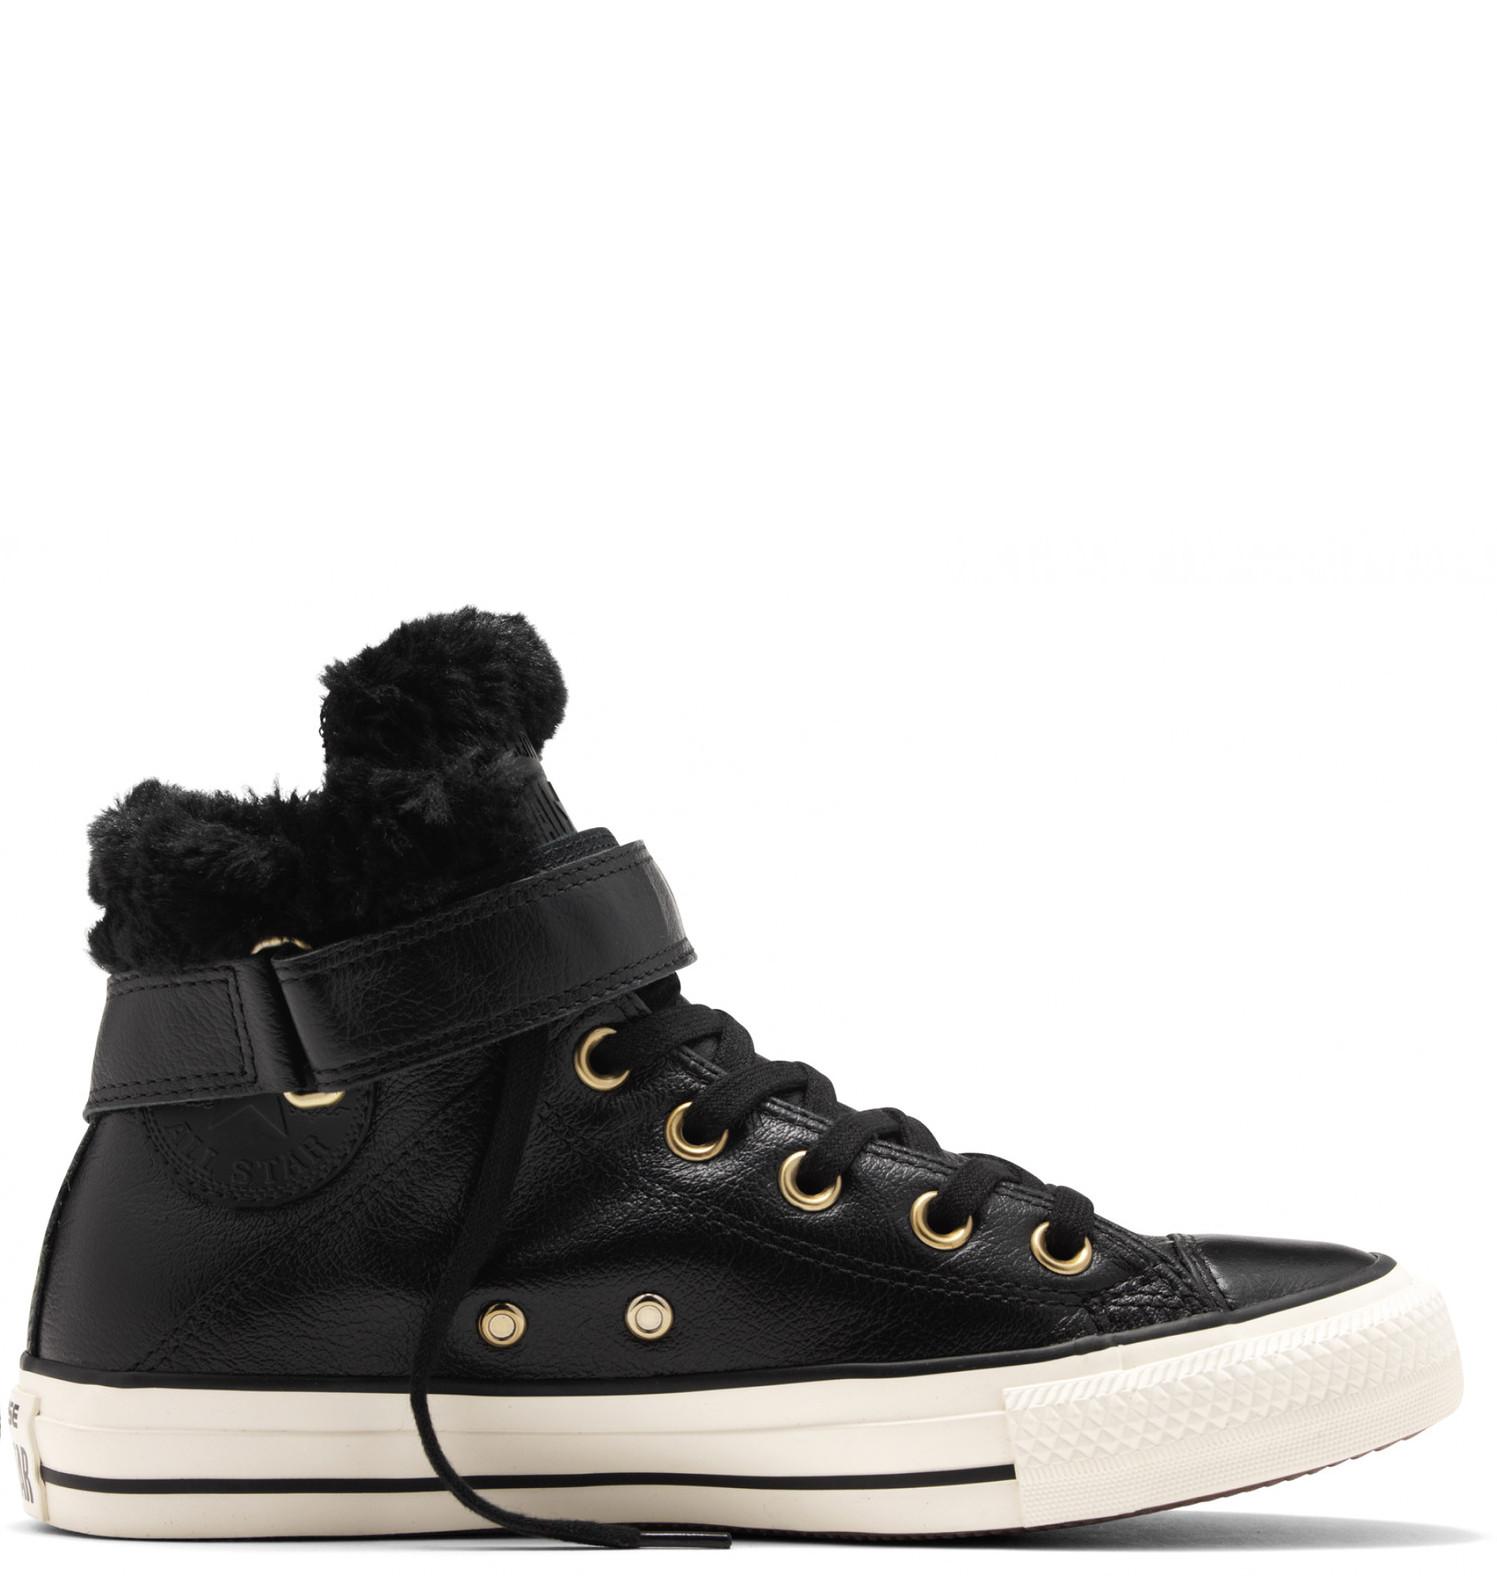 Converse černé kožené dámské boty Brea s kožíškem - 36 - Glami.cz bbc8b36950